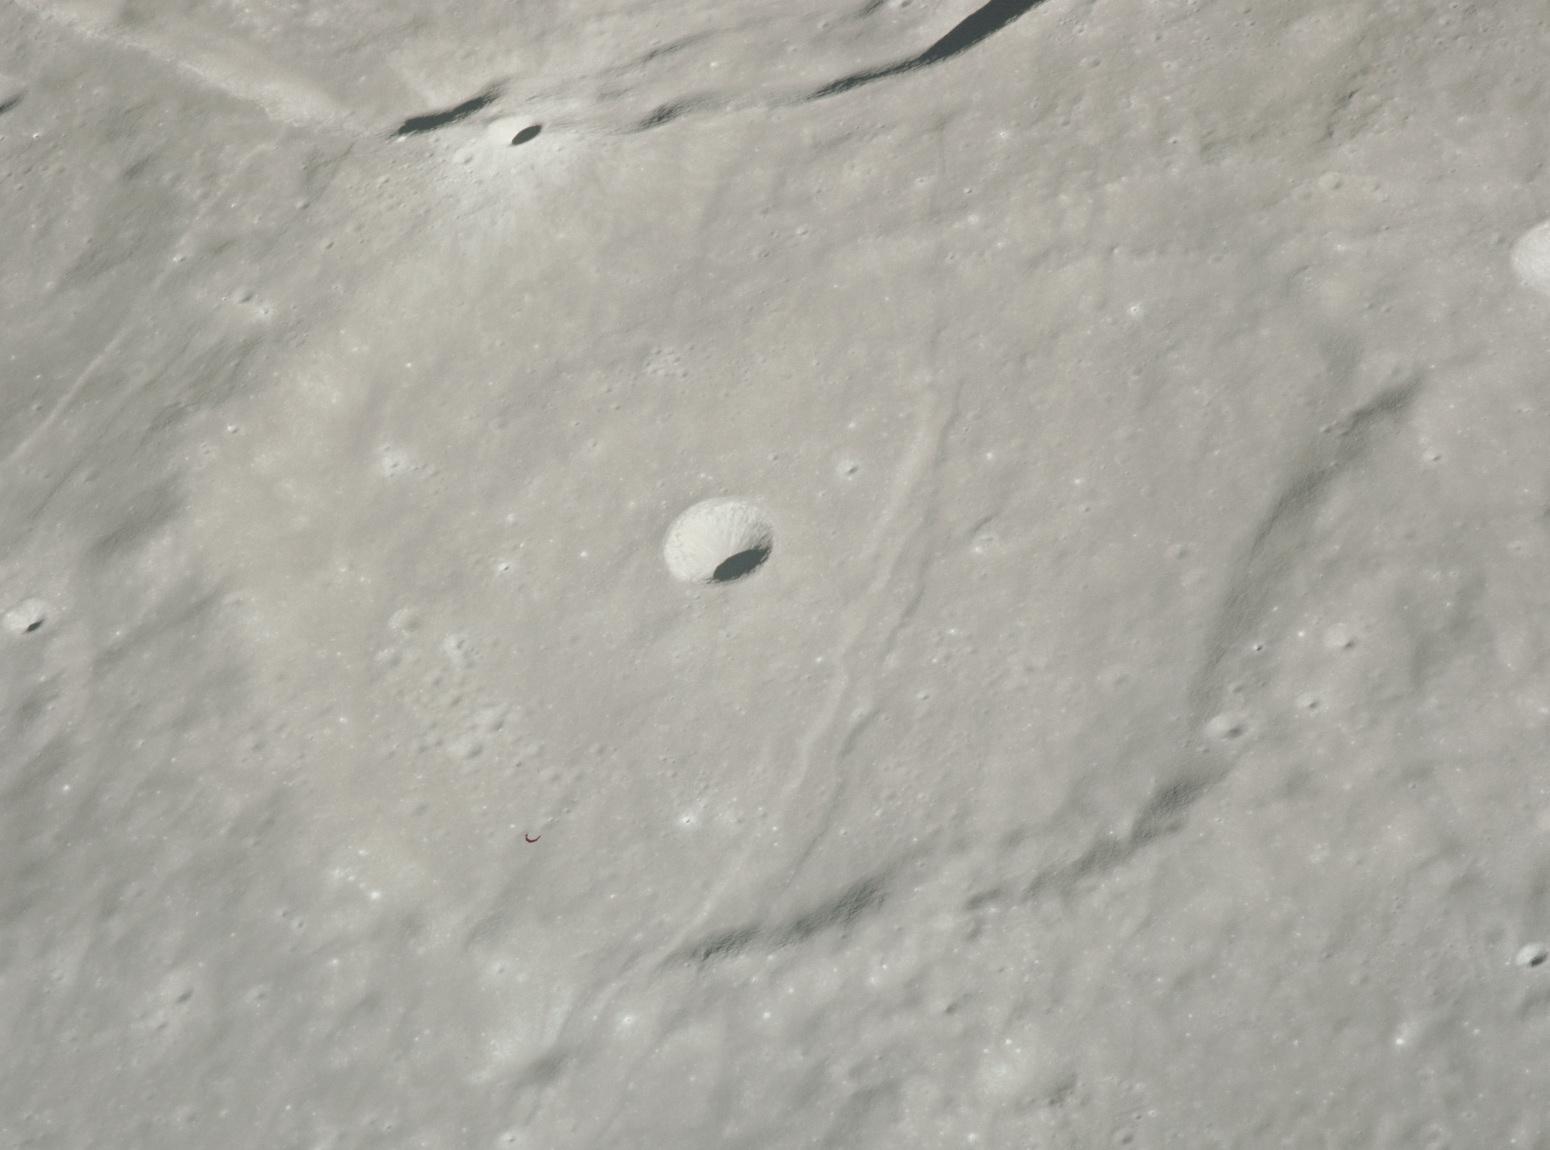 Cratère Chacornac - Image Apollo 15